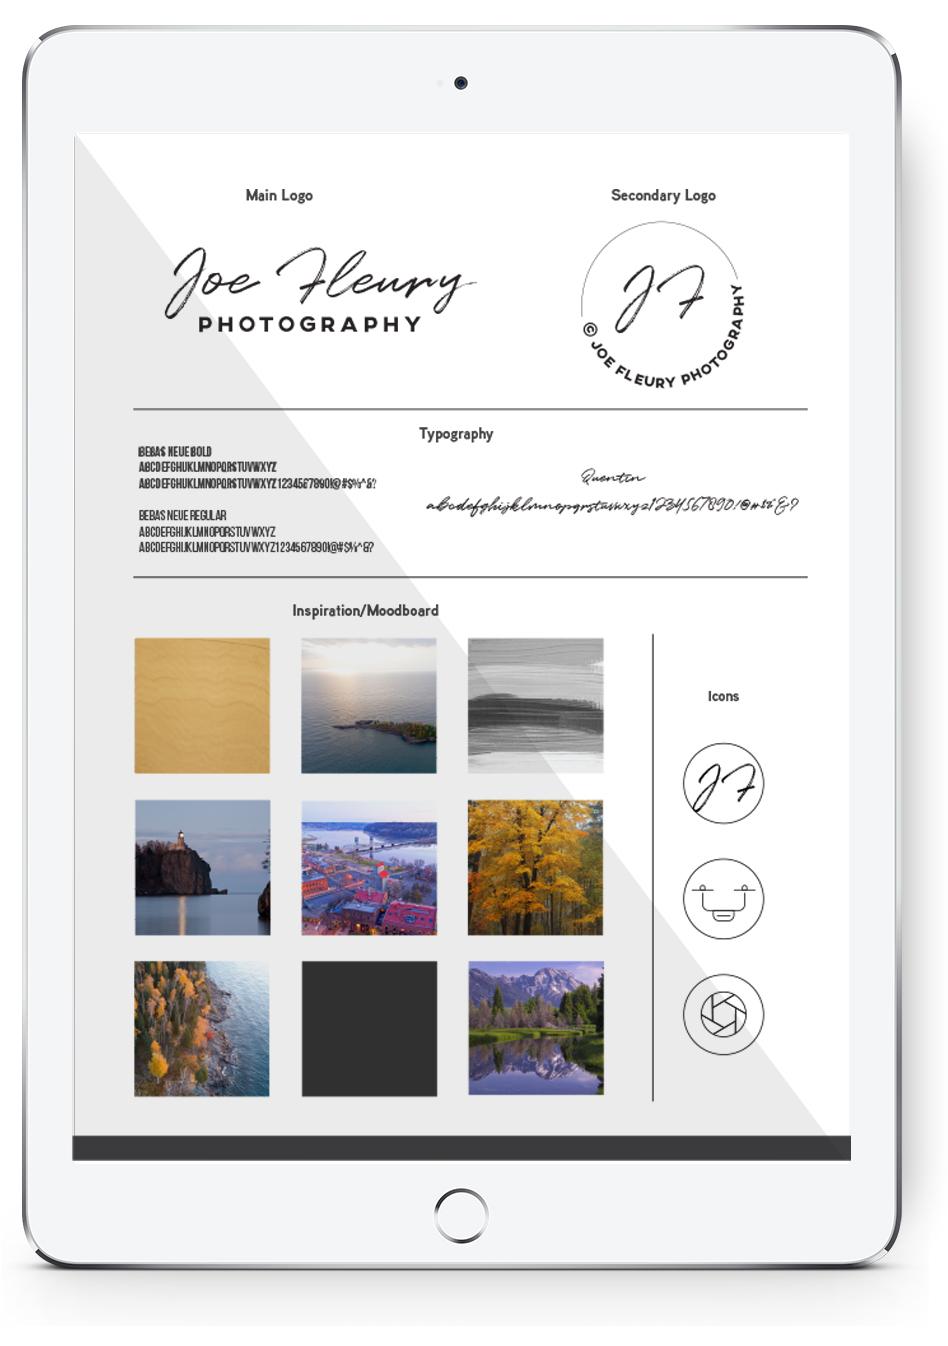 JoeFleuryPhotography_Branding.jpg